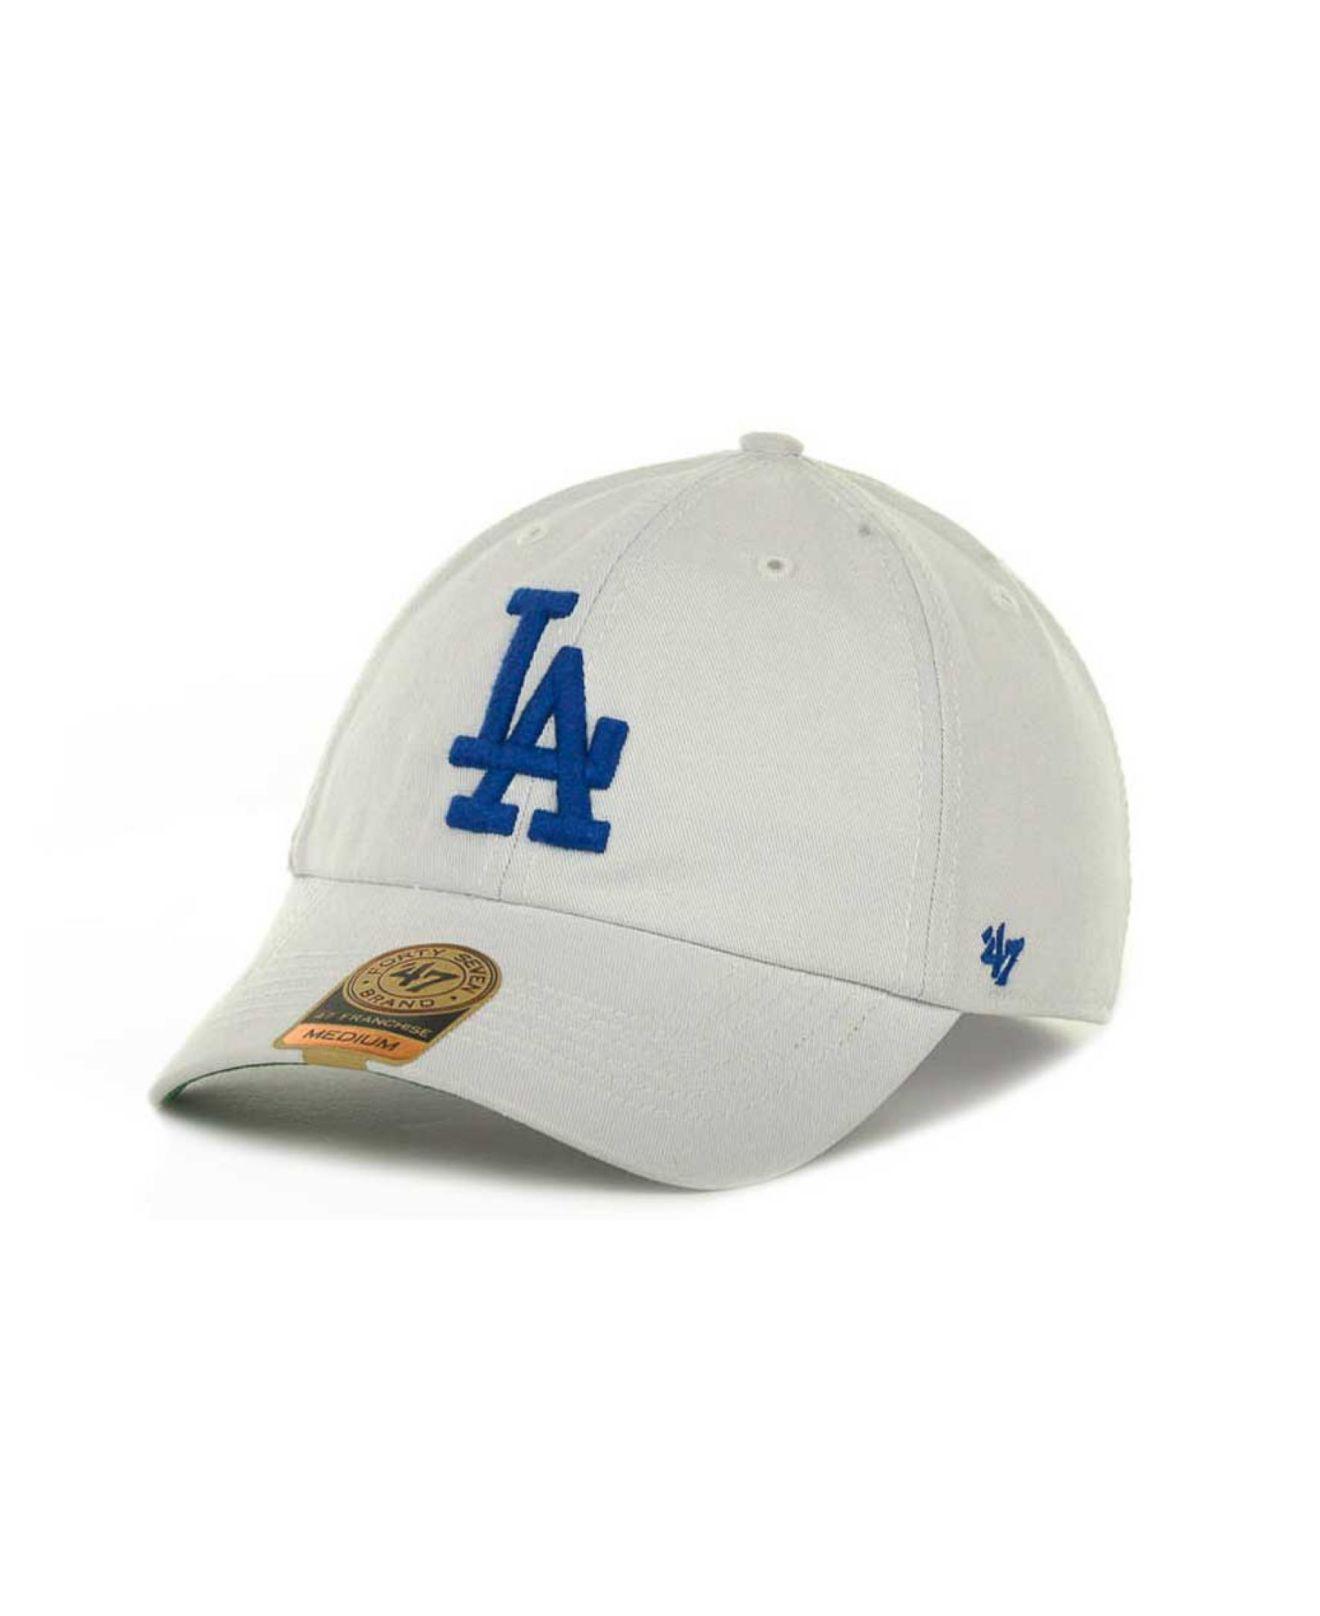 Lyst - 47 Brand Los Angeles Dodgers Mlb  47 Franchise Cap in White ... 227dcf4fffb2